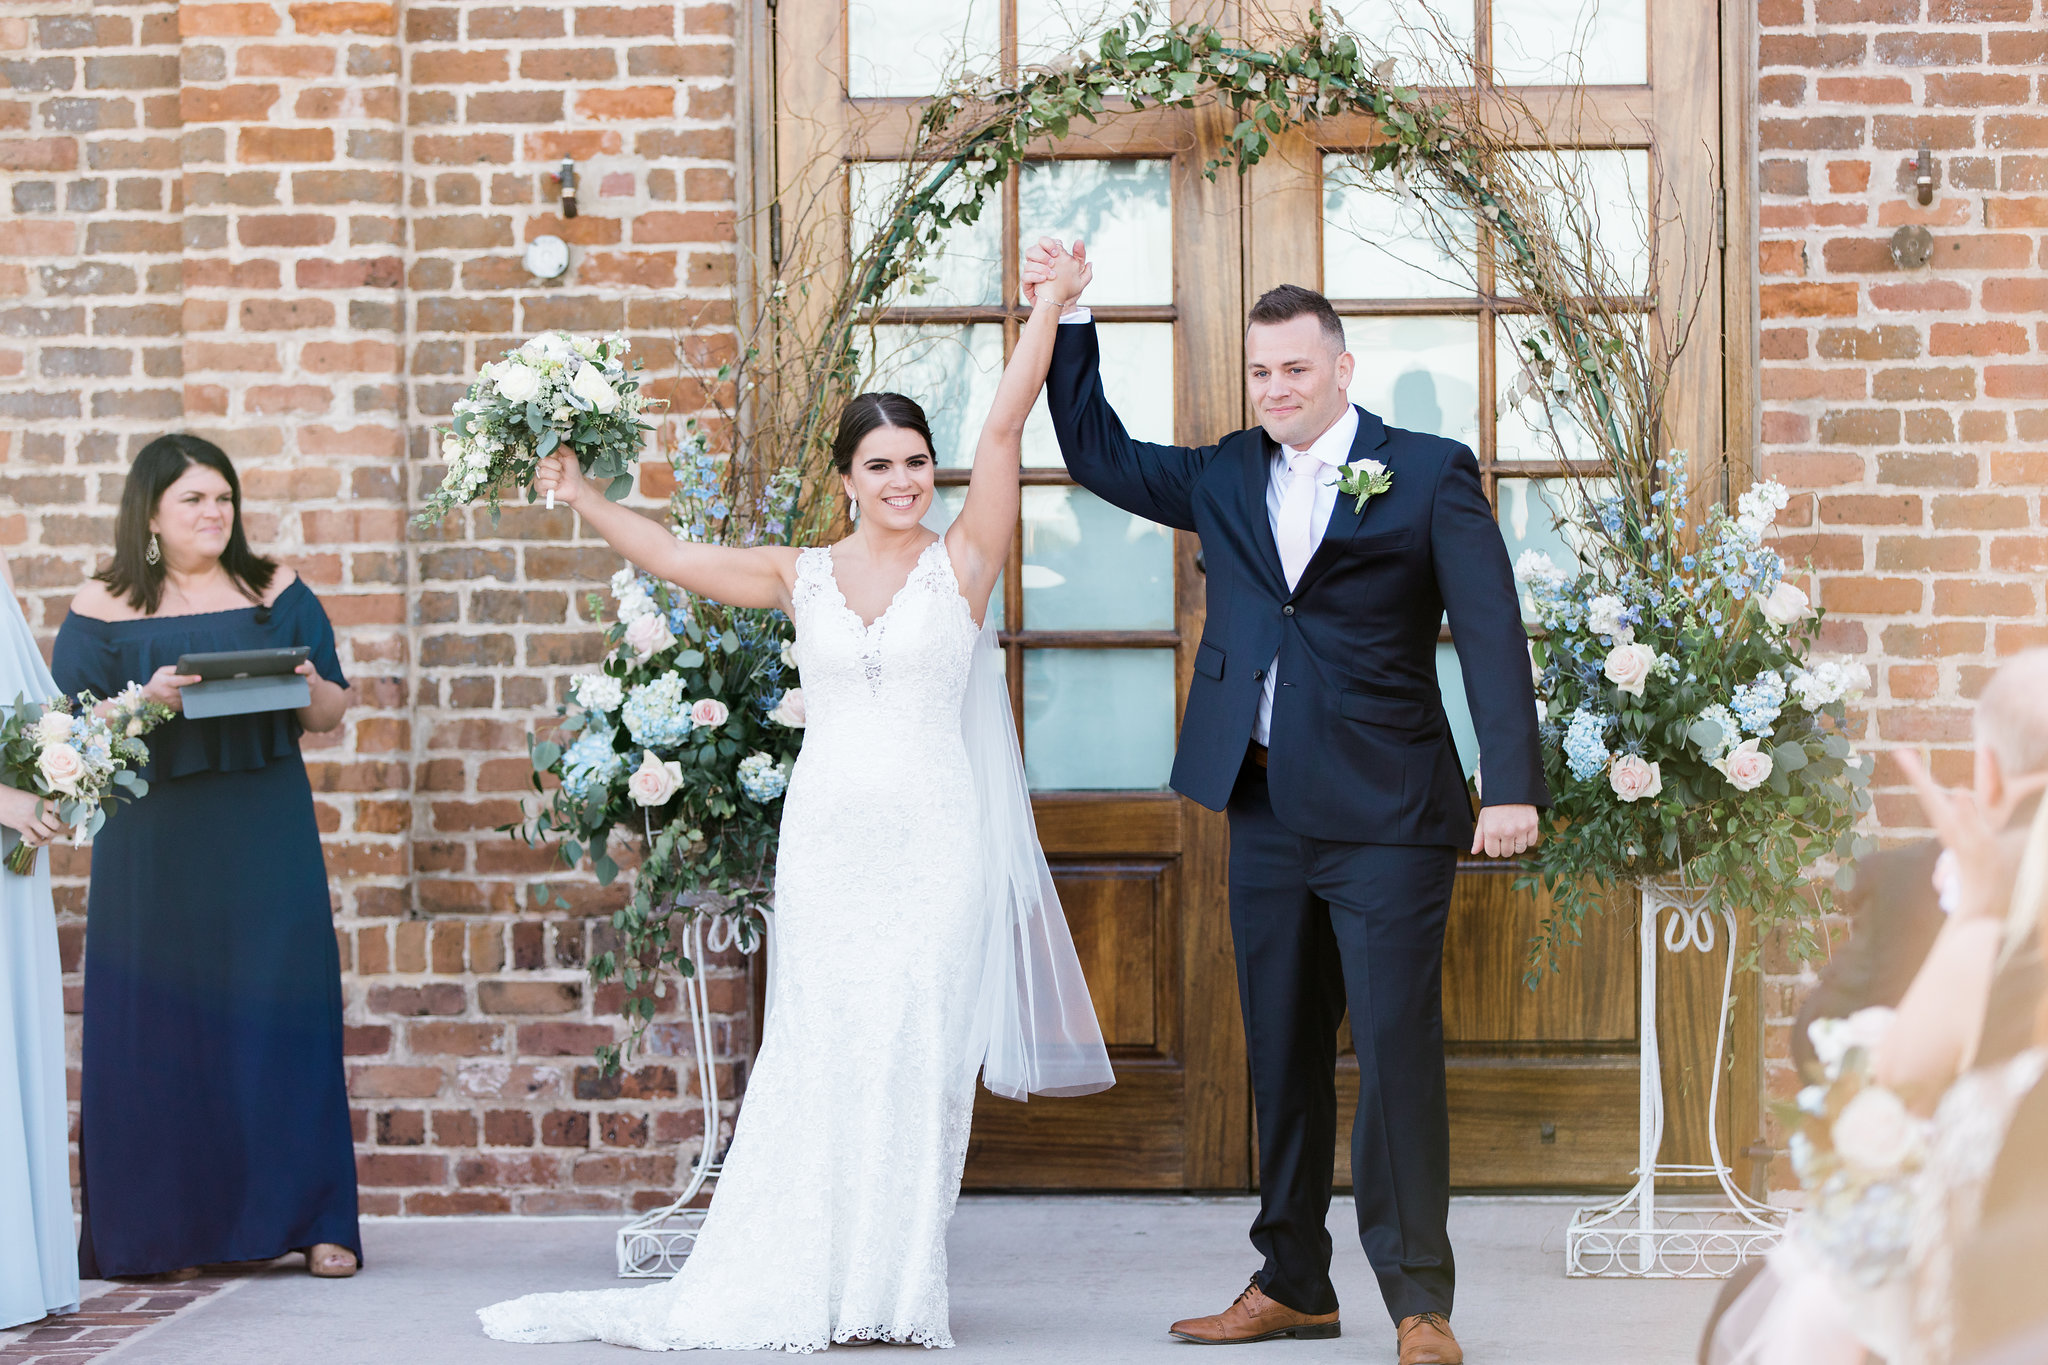 apt-b-photography-Savannah-wedding-photographer-savannah-engagement-photographer-historic-savannah-engagement-charles-h-morris-center-wedding-savannah-weddings-41.JPG